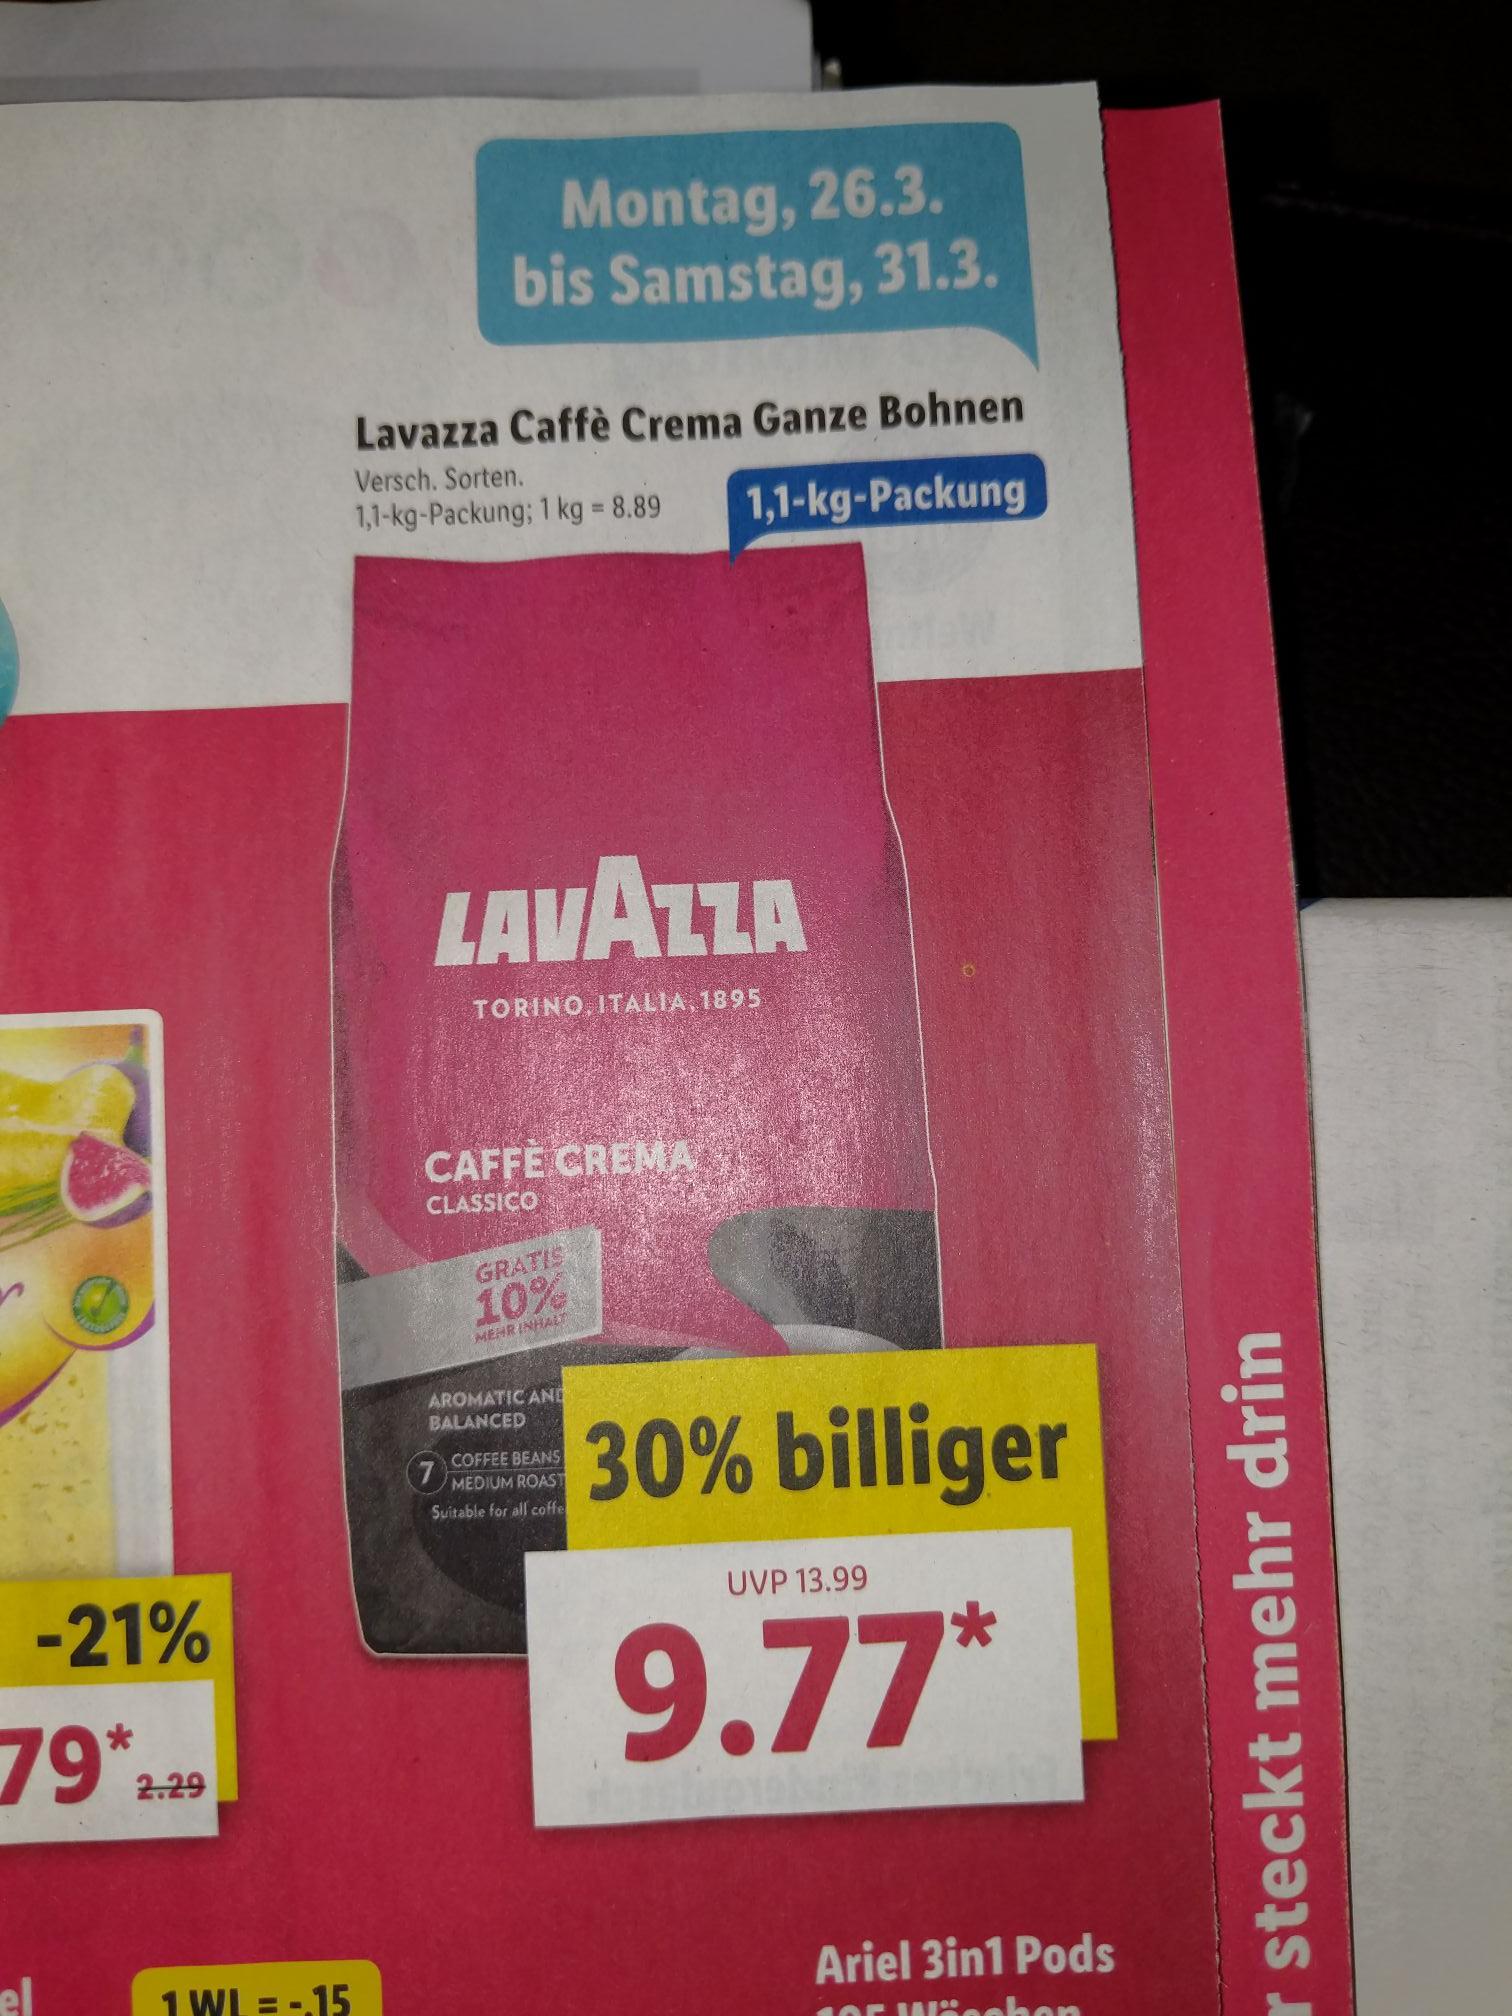 [Lidl] Lavazza Caffe Crema 1,1Kg / Versch. Sorten